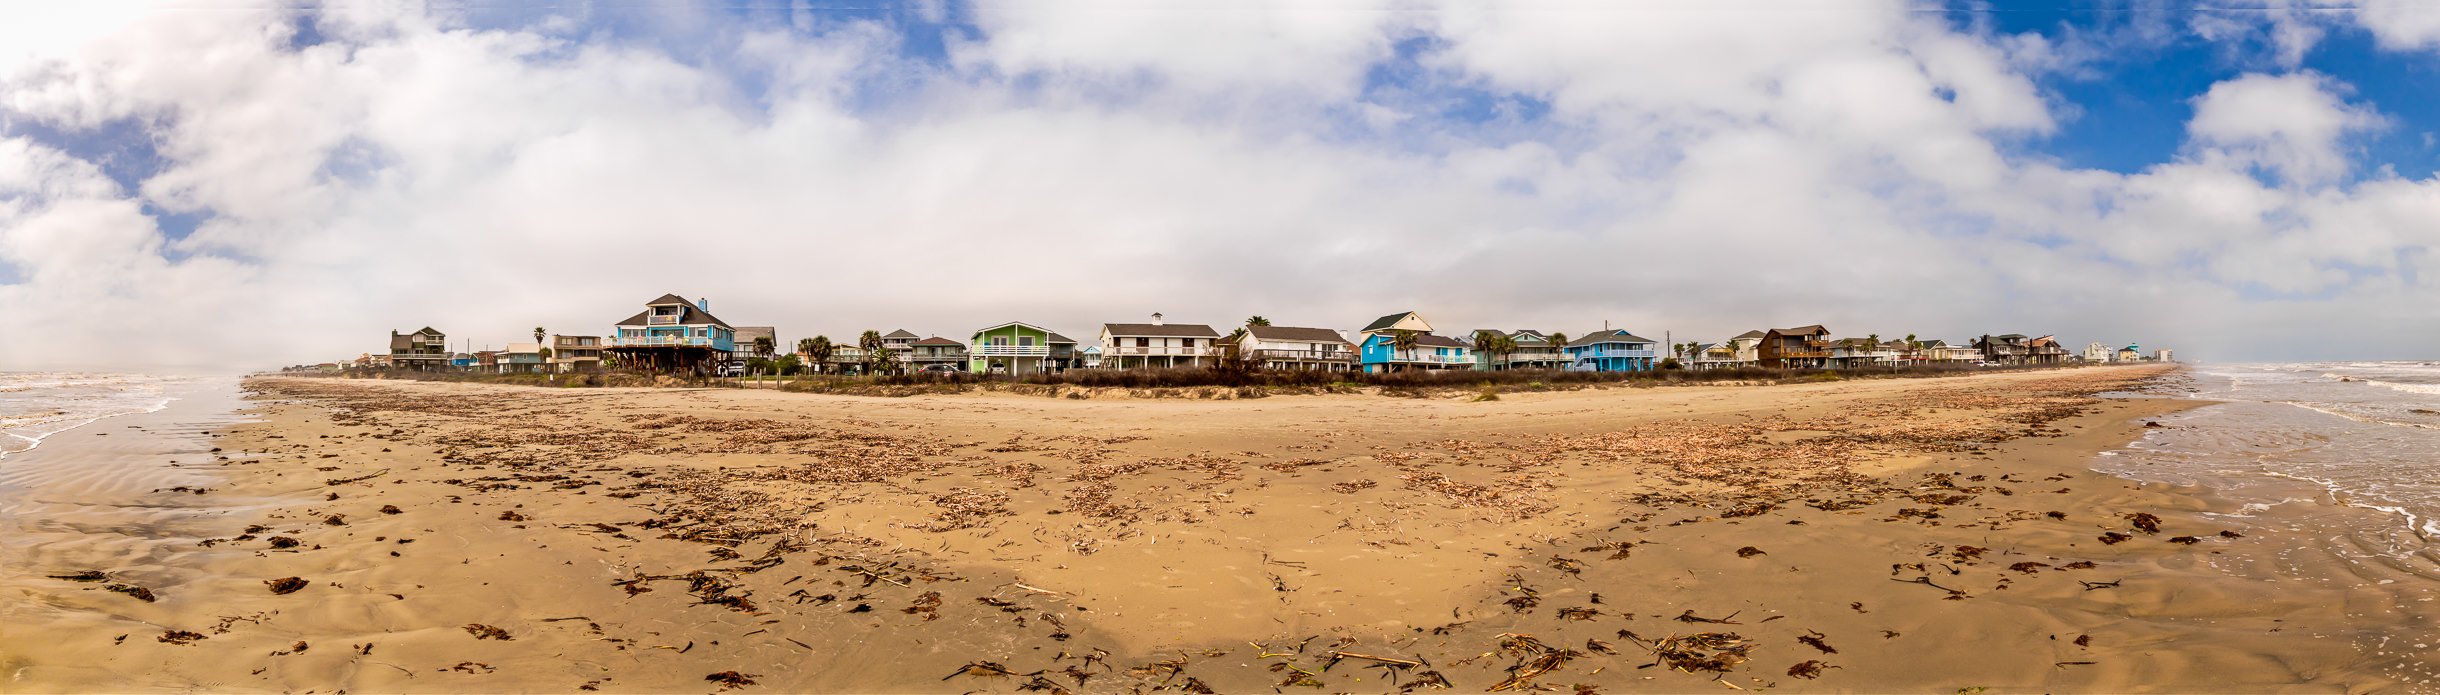 Beach houses line the seaweed-covered sandy beach at Galveston, Texas.